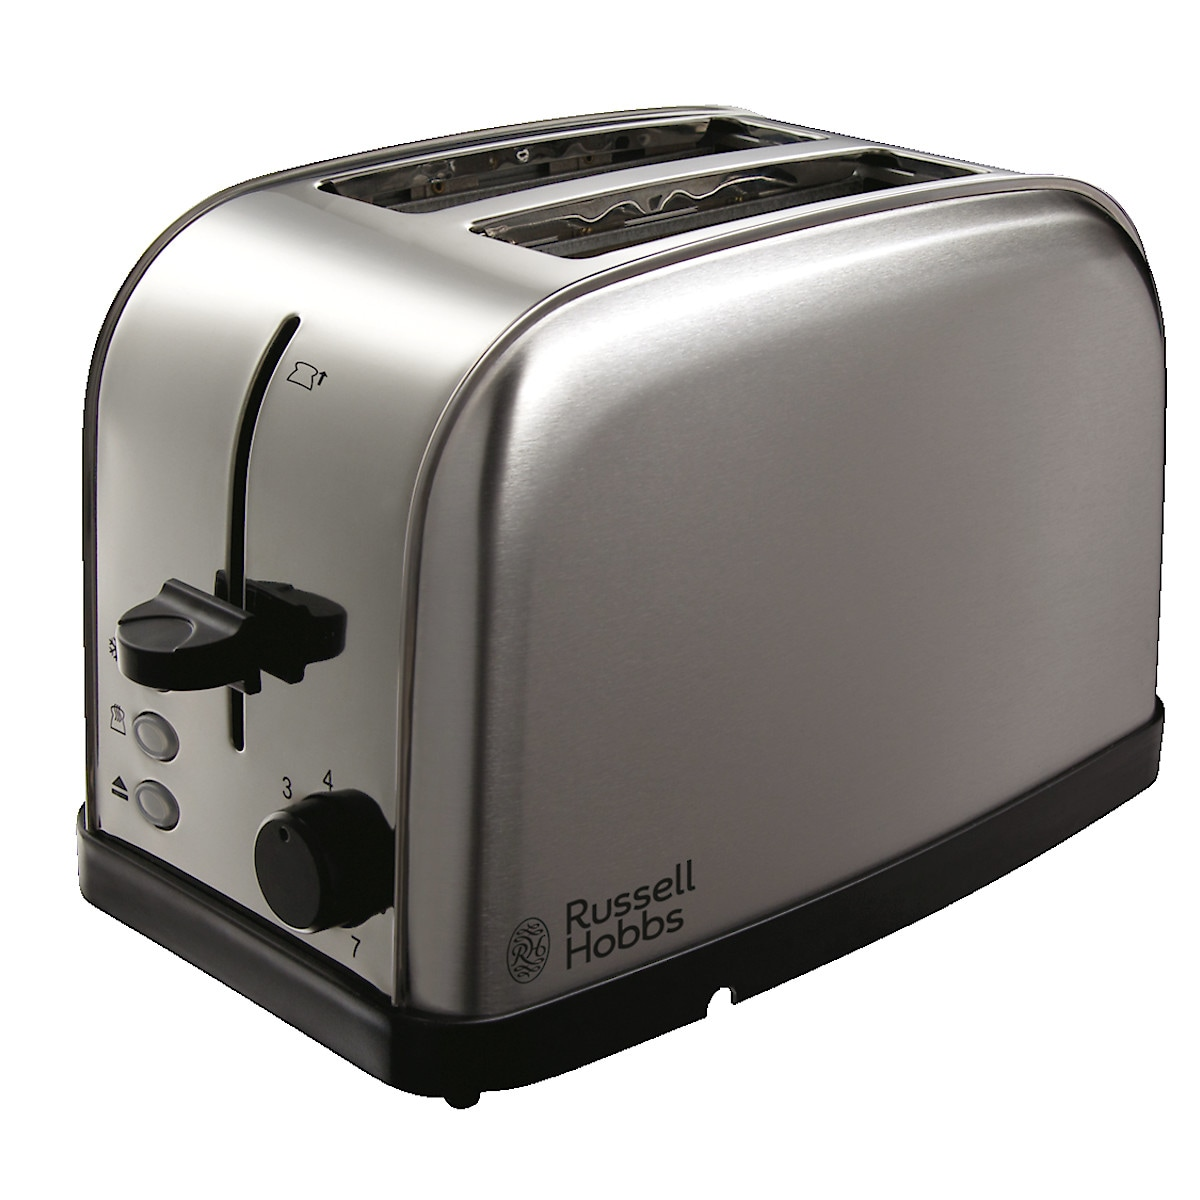 Russell Hobbs 18780 Futura 2-Slice Toaster